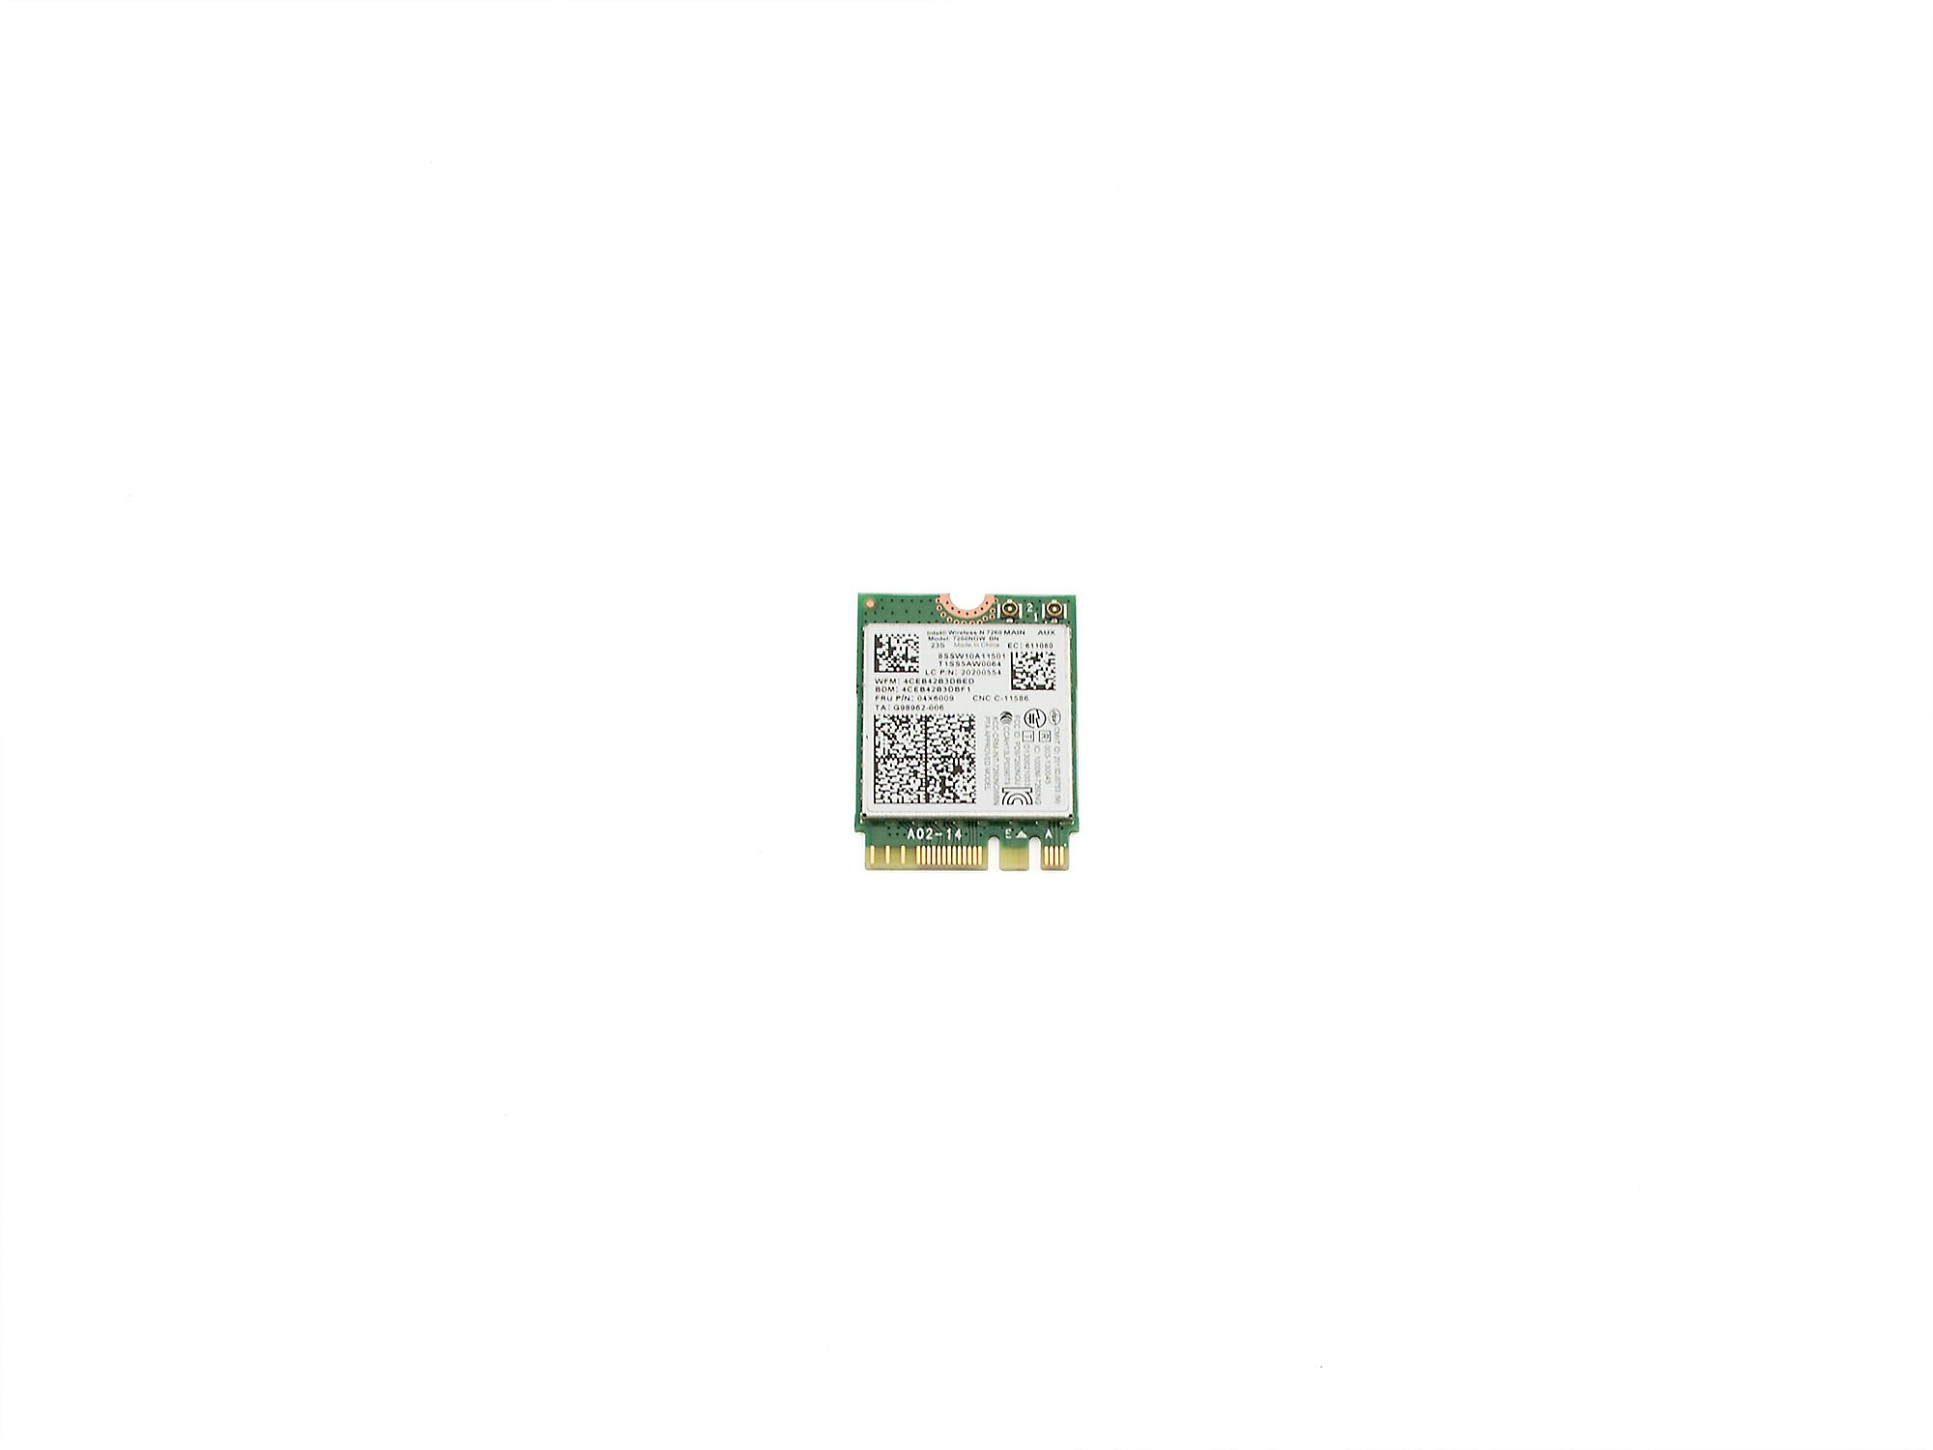 Intel Wireless-N 7260 MAIN für Lenovo ThinkPad X240 (20AL) Serie